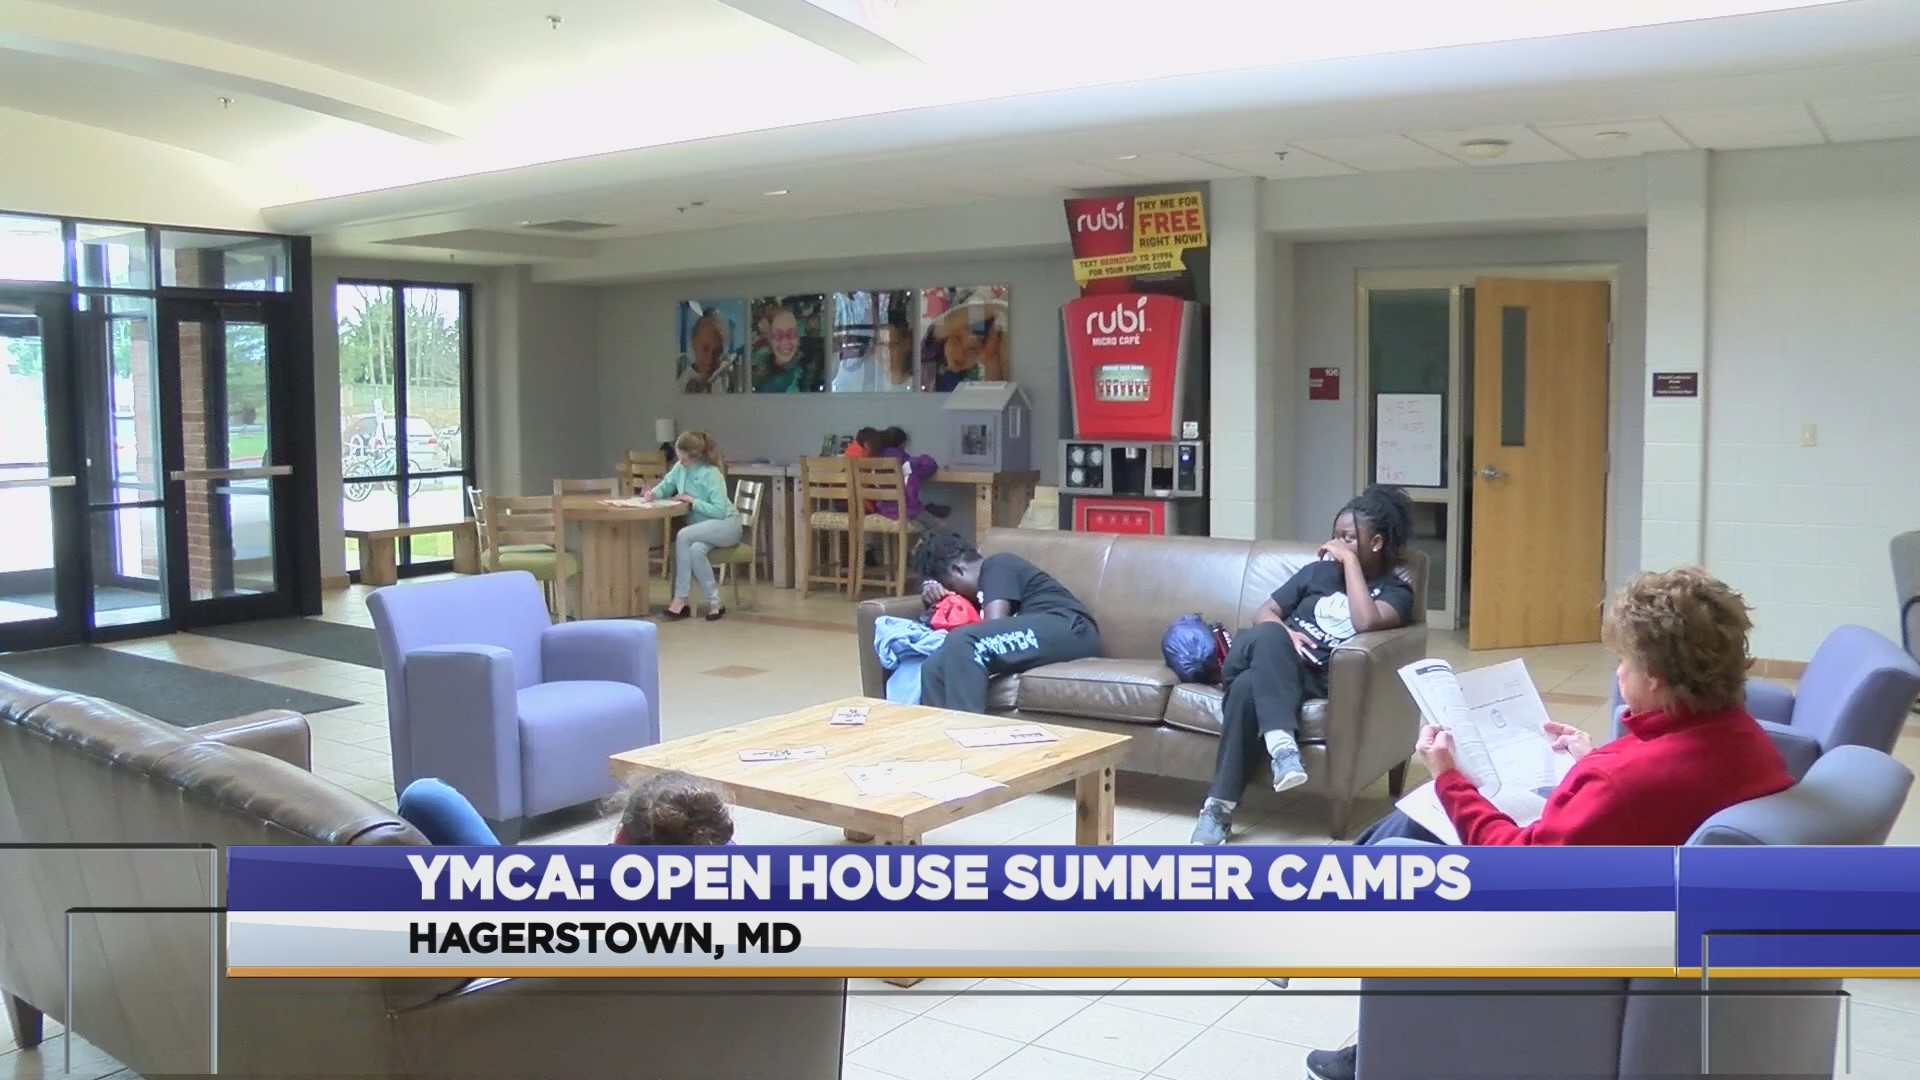 YMCA_open_house_0_20180407235025